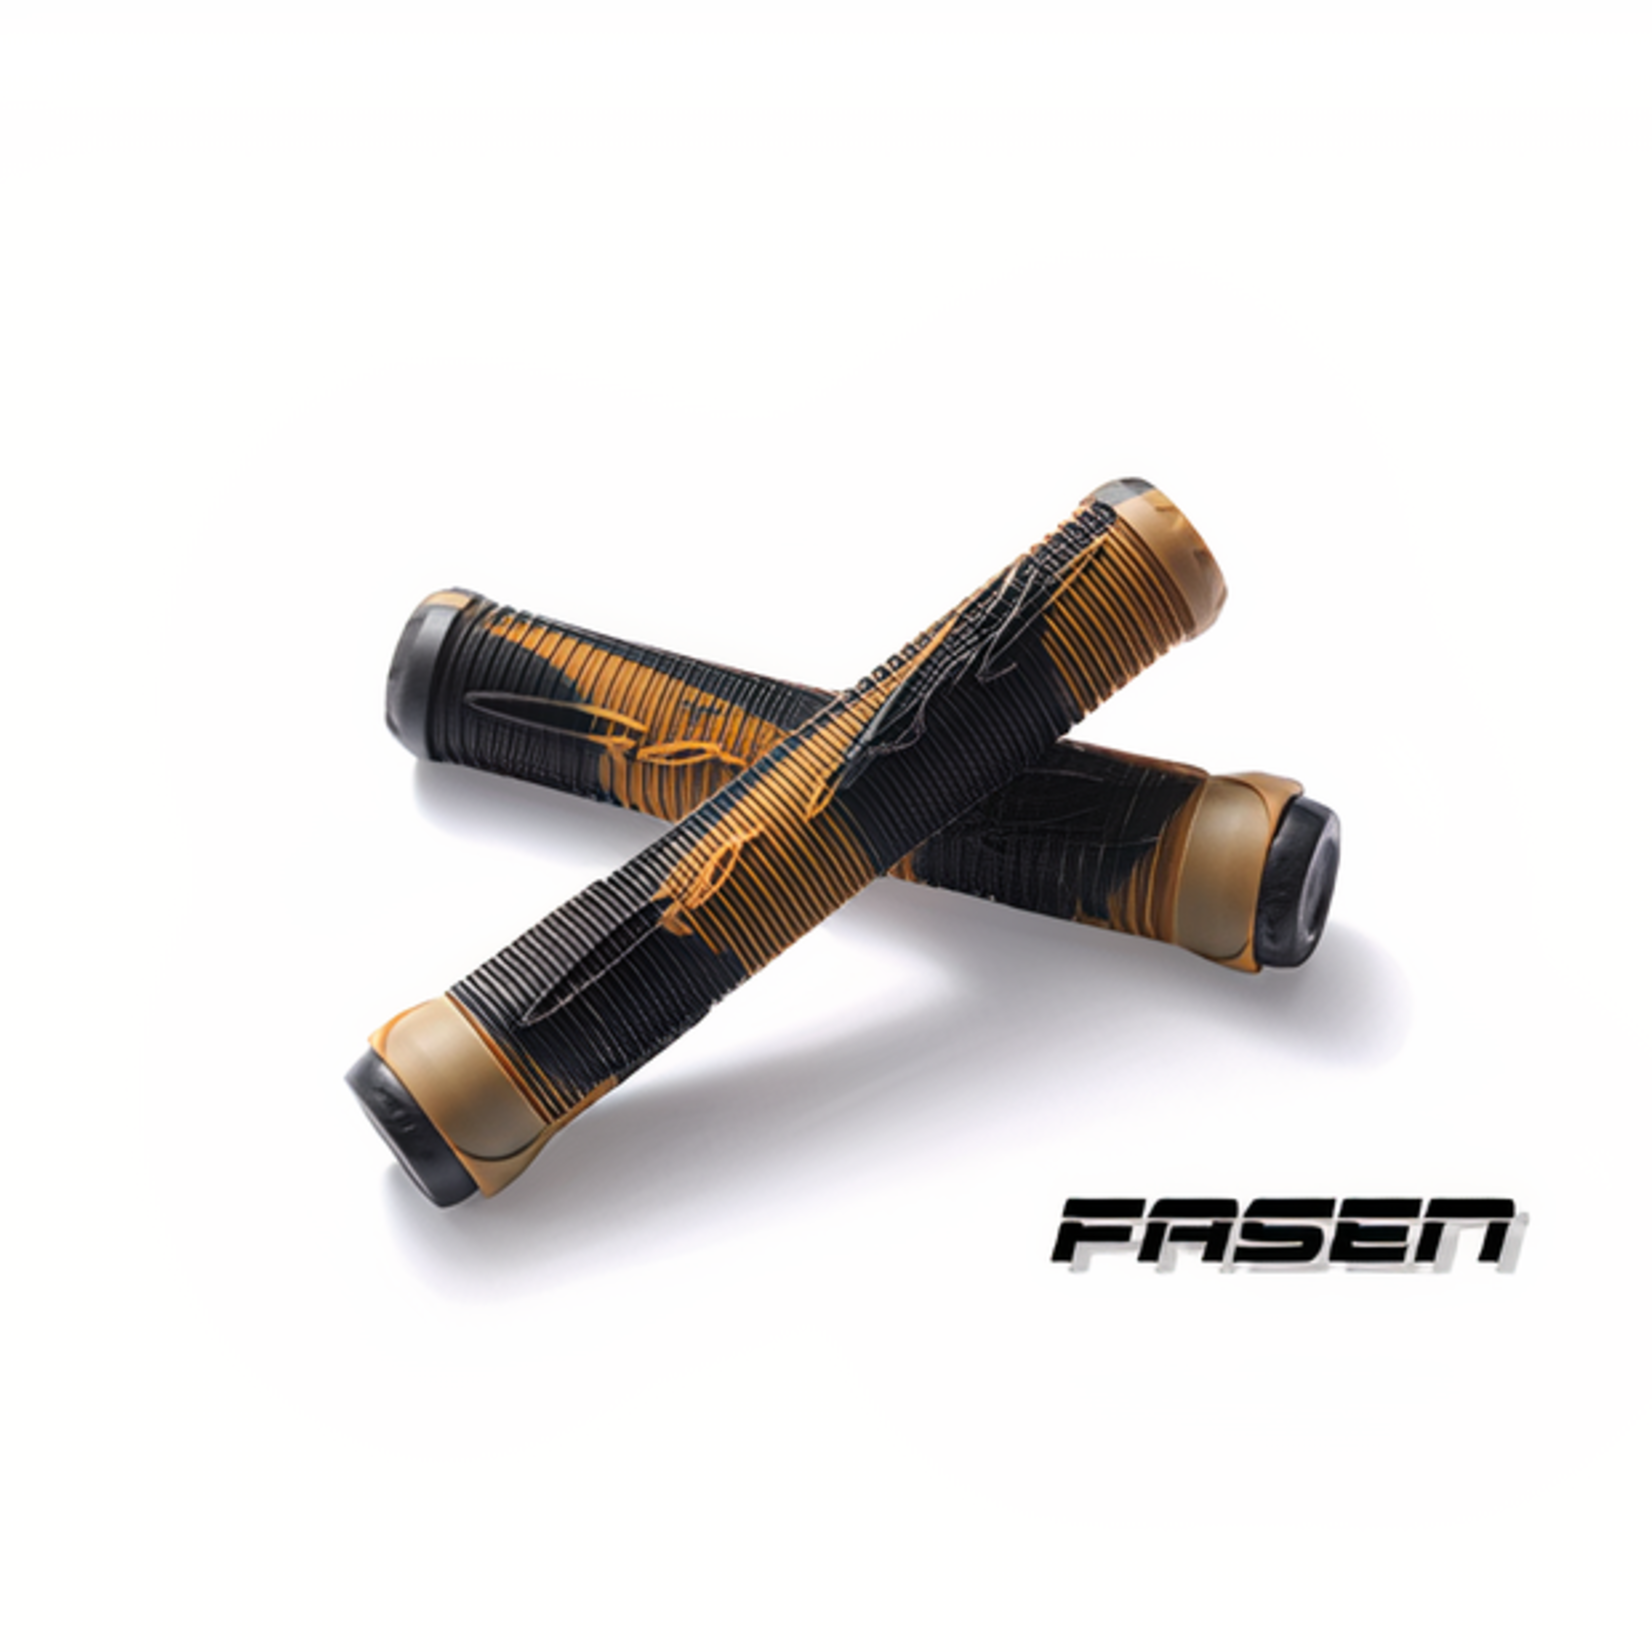 Fasen Fasen - Fast Hand Grips - Black / Gum